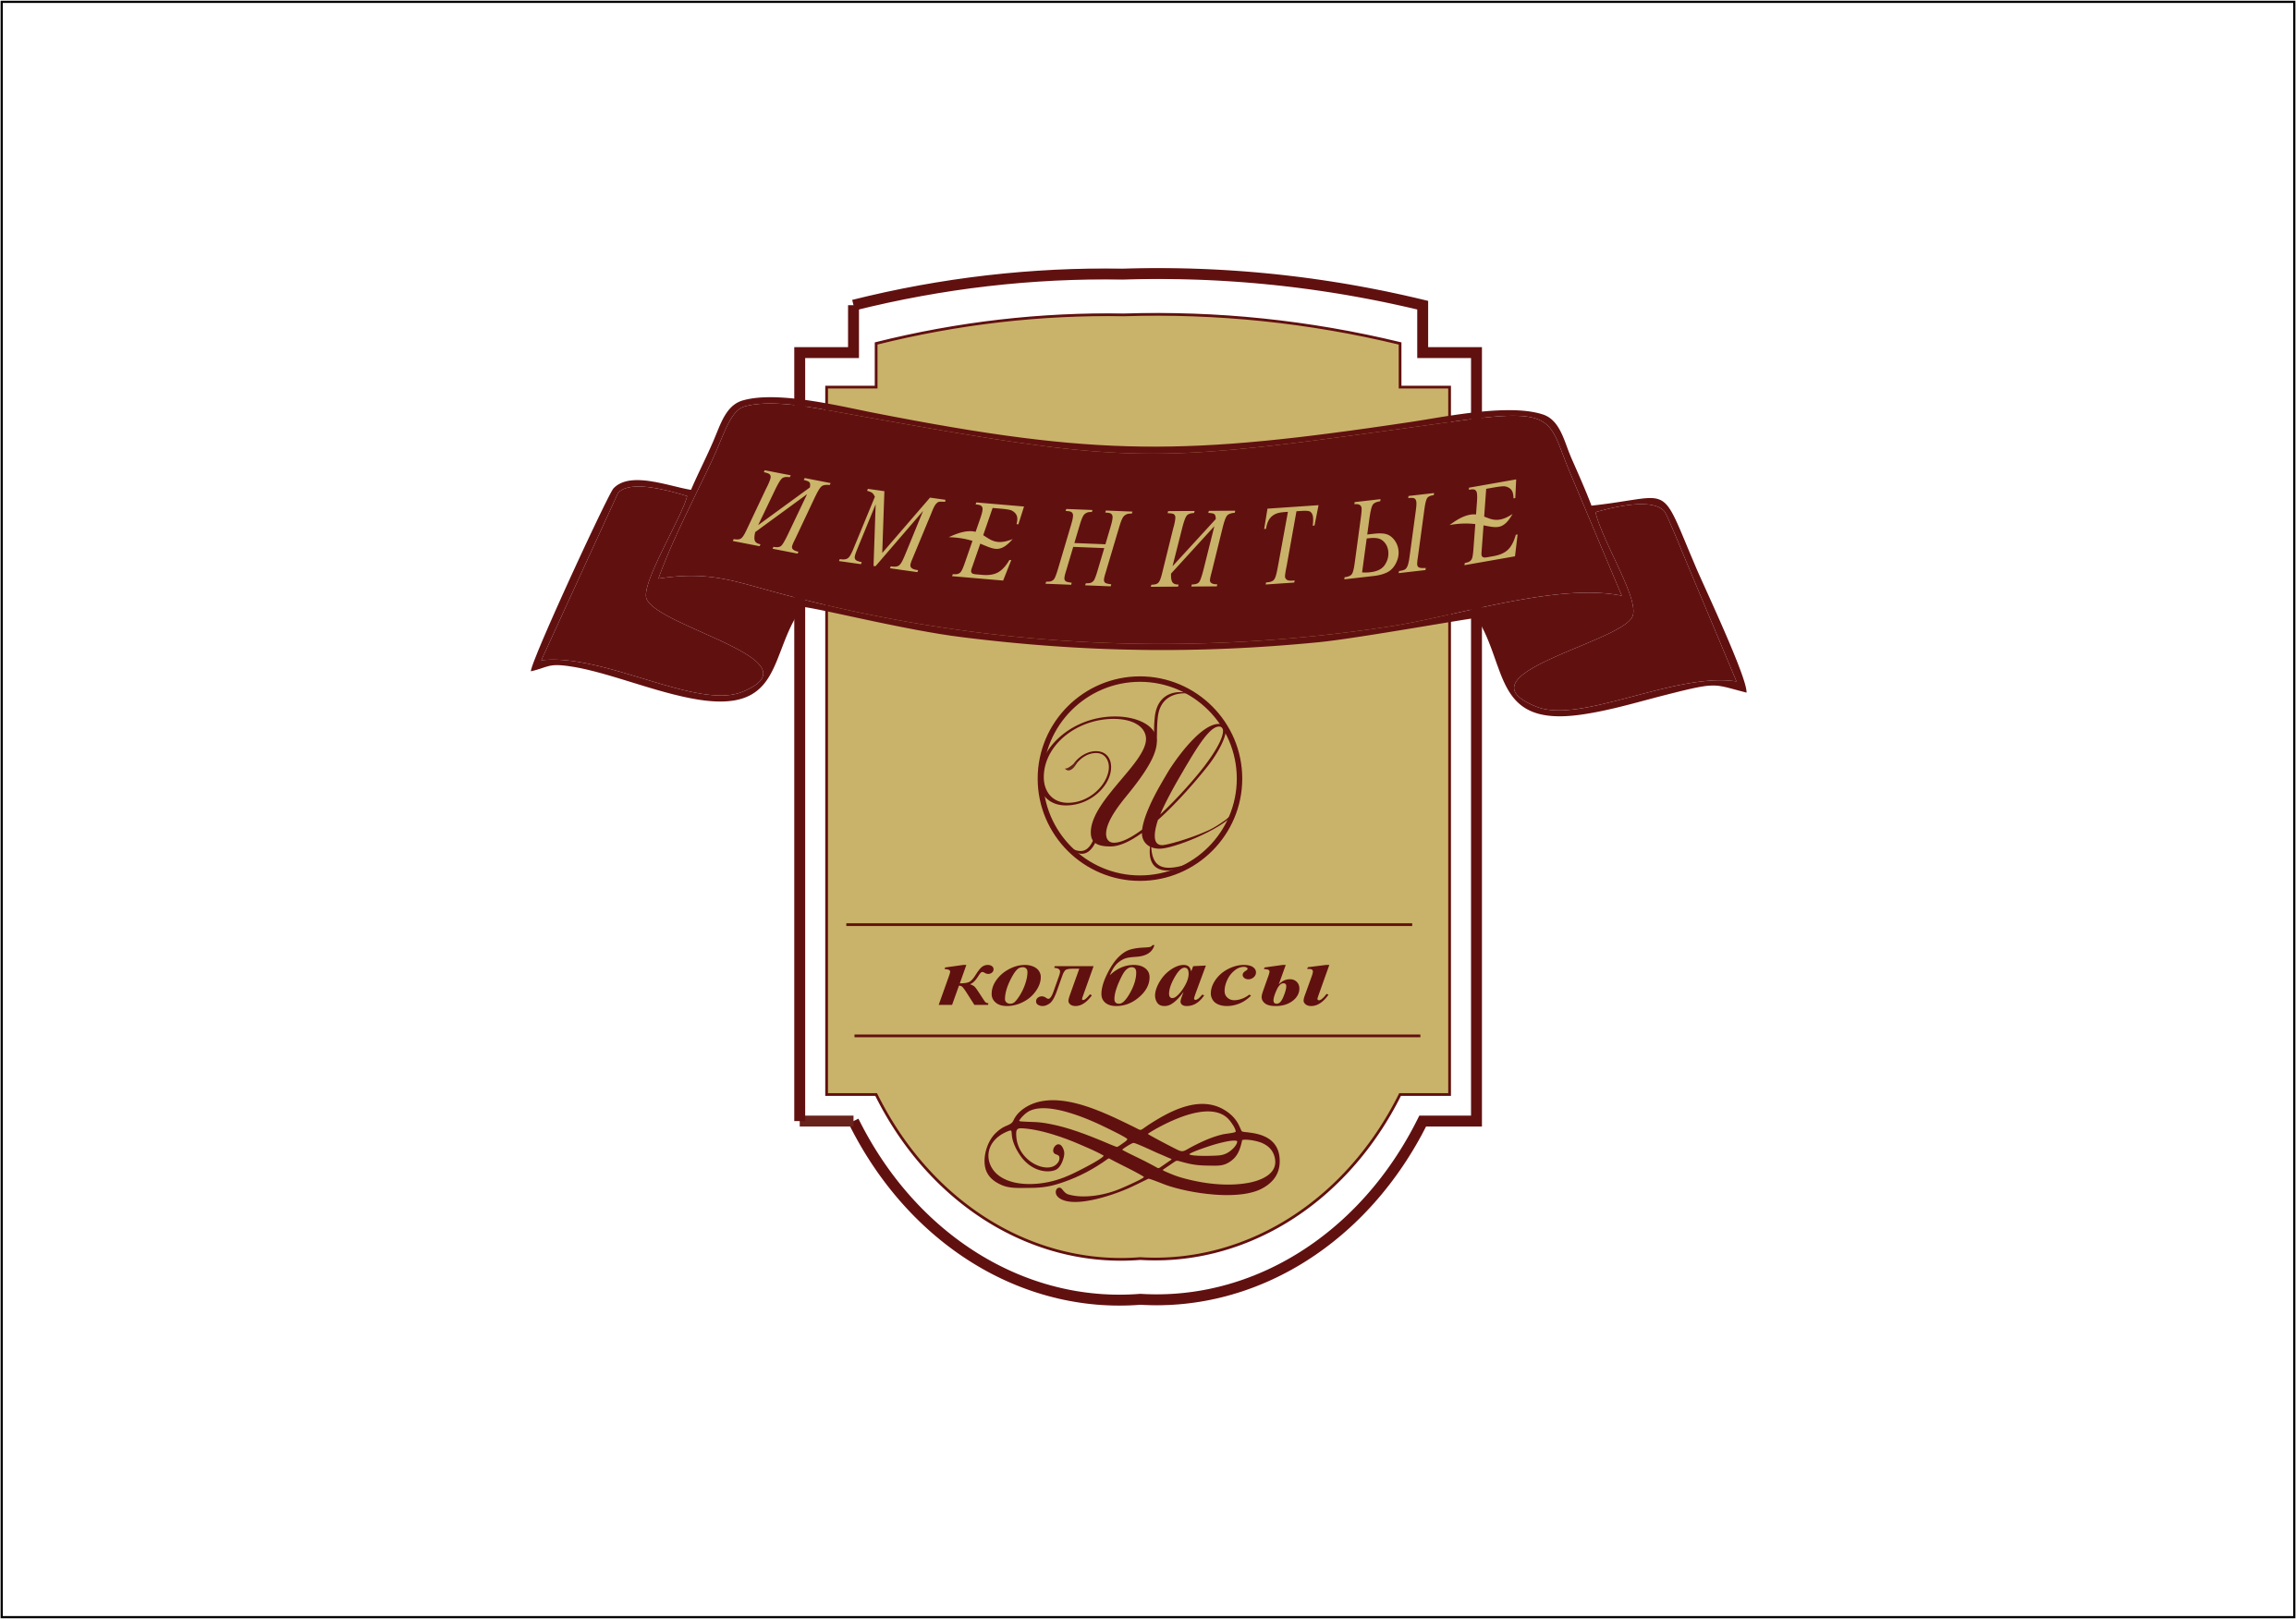 Логотип и фирменный стиль продуктов питания фото f_6325bc3be813c253.png